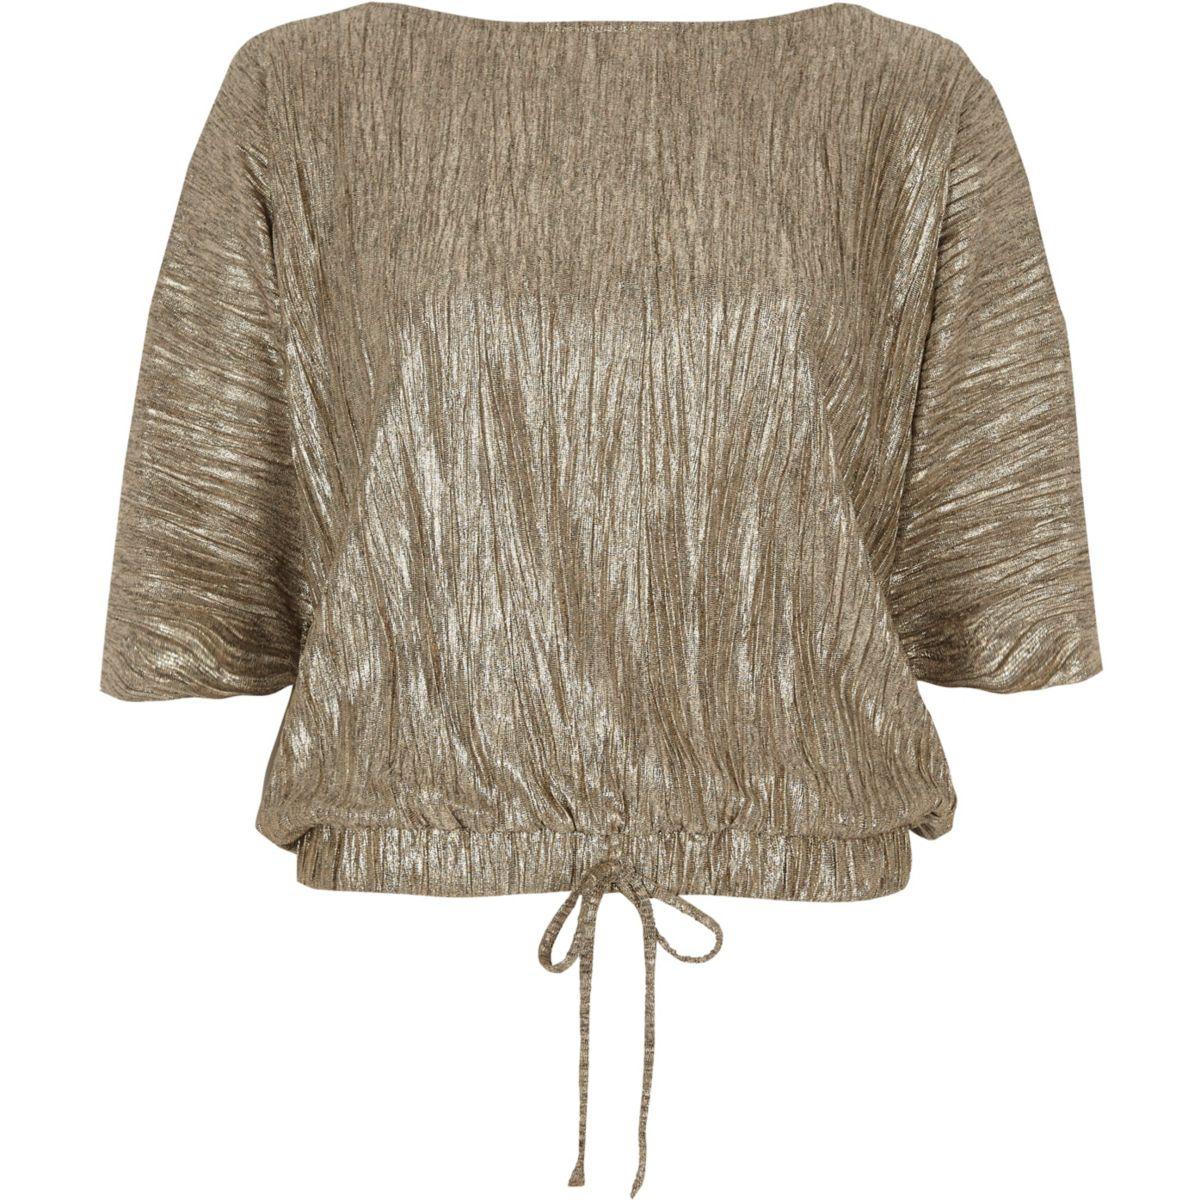 T-Shirt mit Ballonsaum in Gold-Metallic